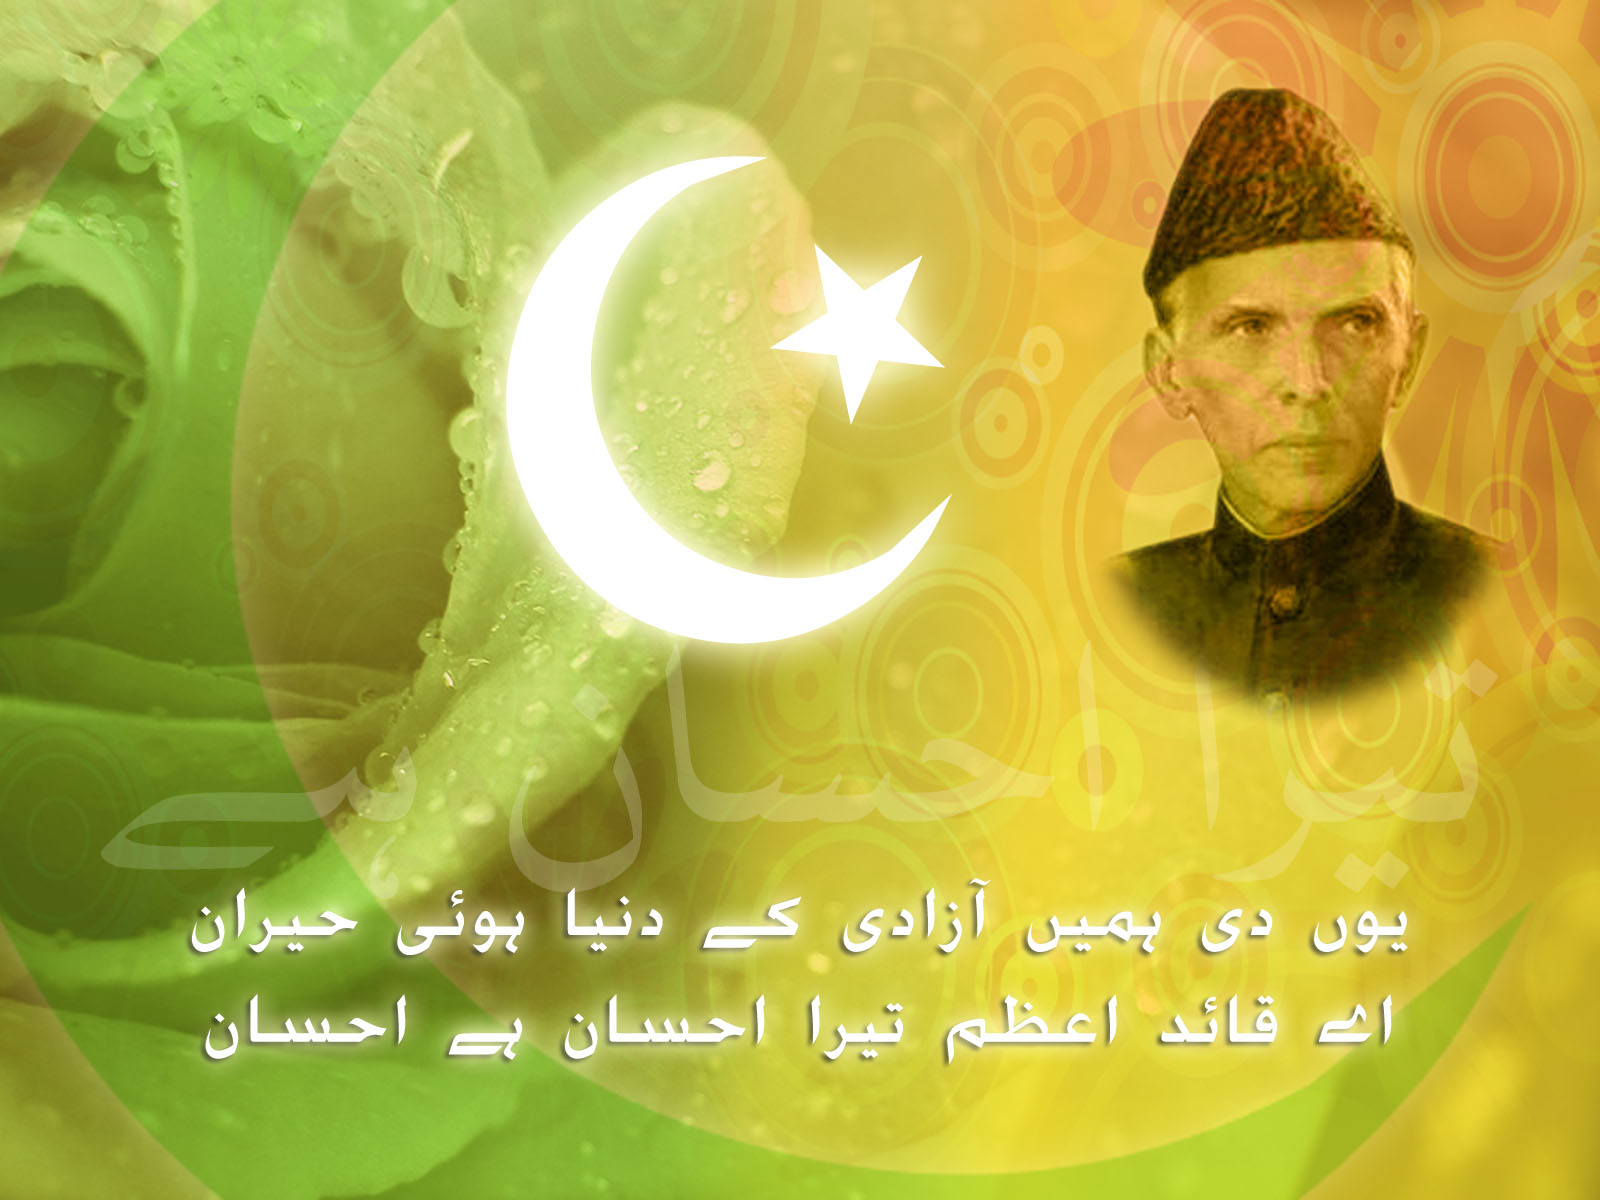 http://3.bp.blogspot.com/_T8dNnfVmWEQ/TGZZ3Y1JeZI/AAAAAAAAAxc/p_0ylkd4vJw/s1600/14+august+wallpaper+pakistan.jpg